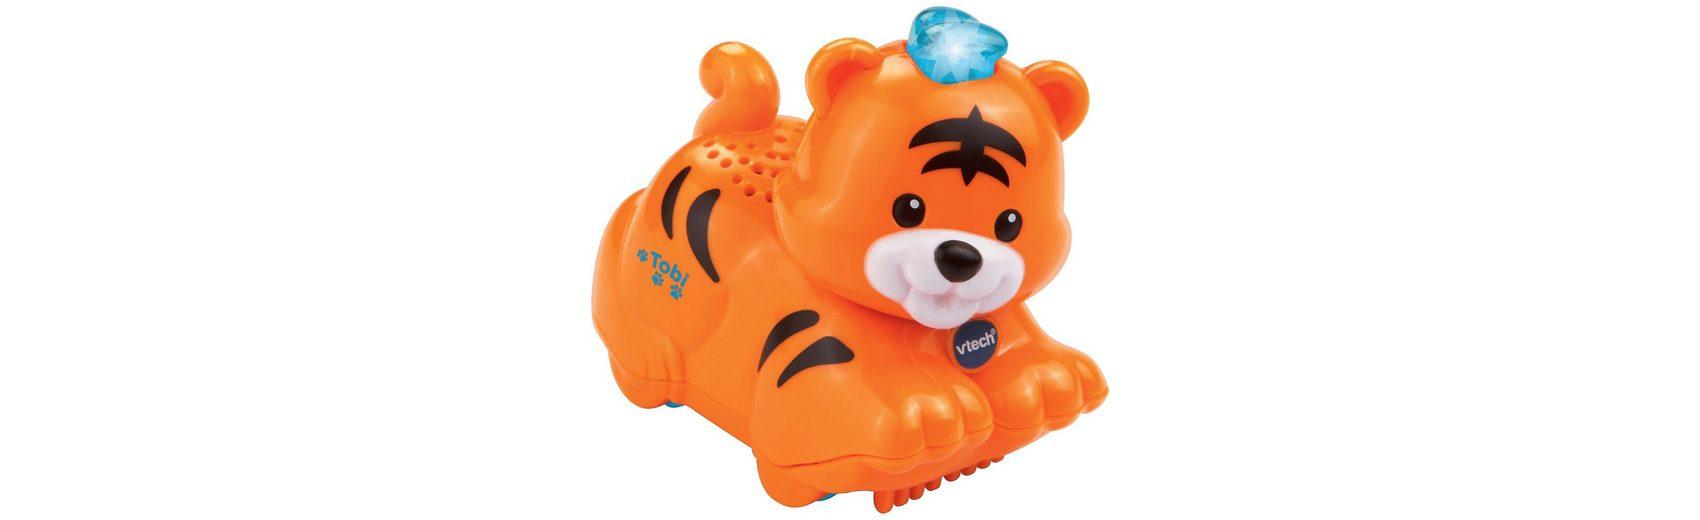 Vtech Tip Tap Baby Tiere - Tiger Tobi